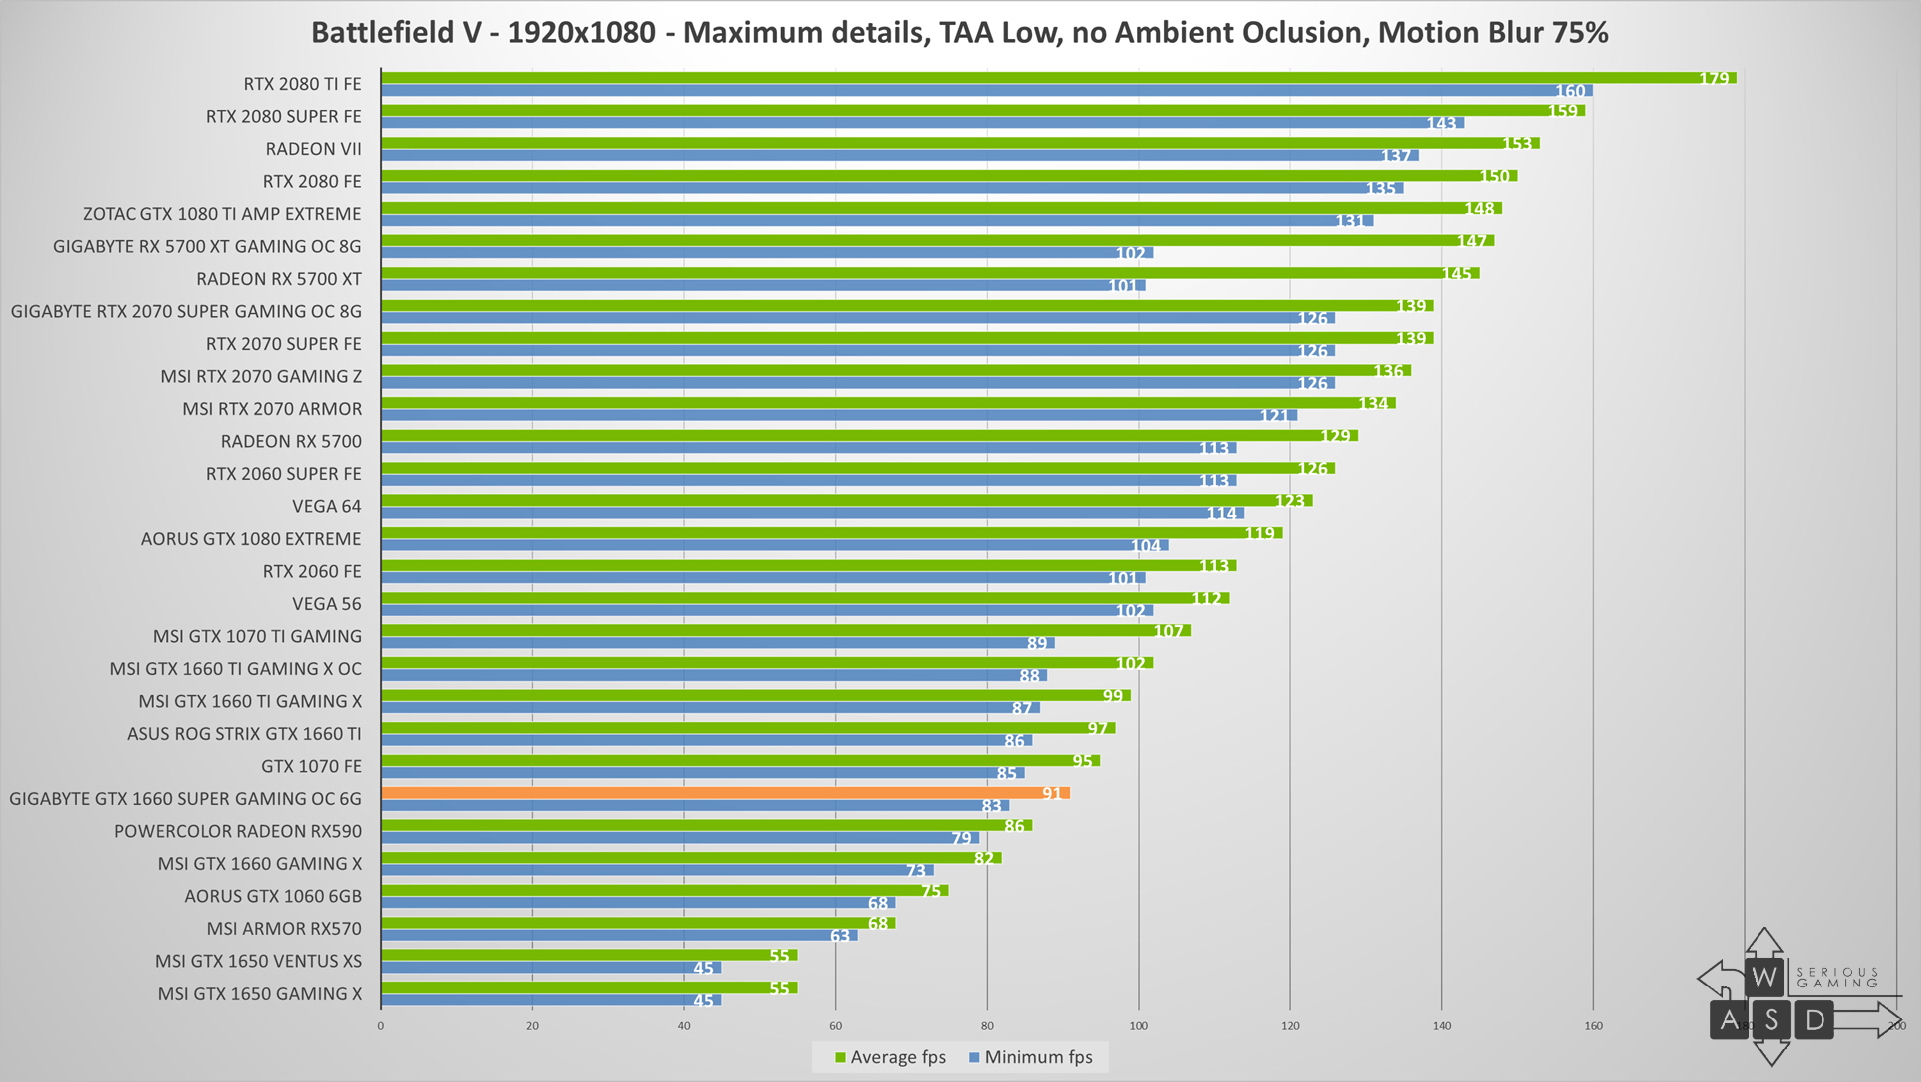 Gigabyte GeForce GTX 1660 Super review | WASD.ro